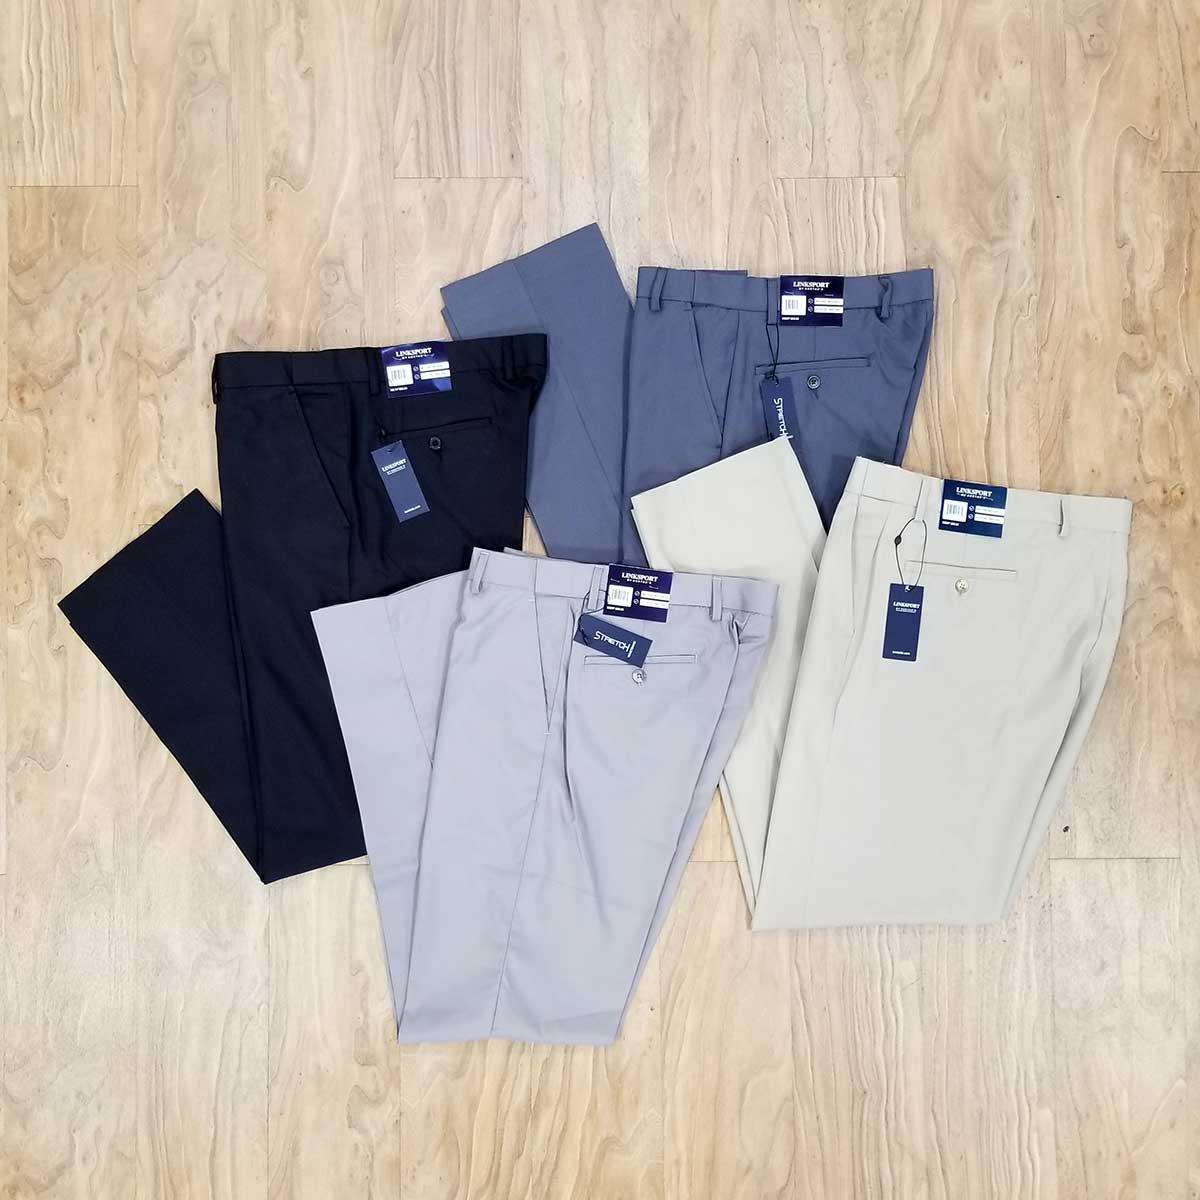 Linksport Premium Golf Pant - Black